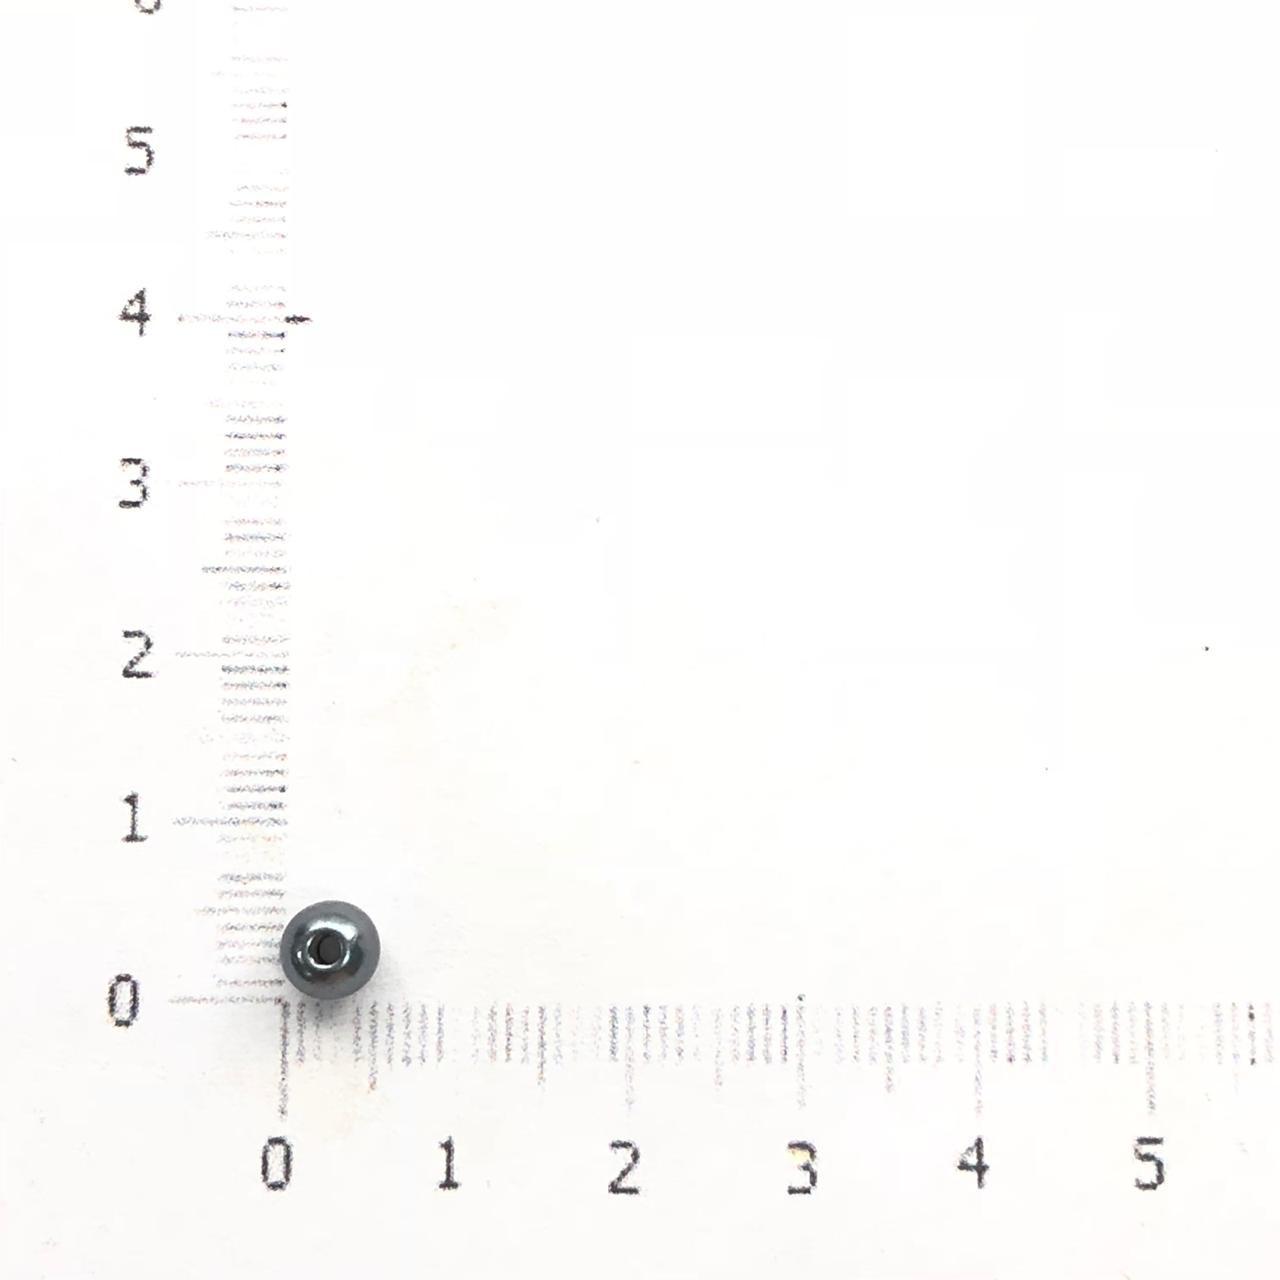 PE124 - Pérola de Resina 5m Grafite - 10Grs